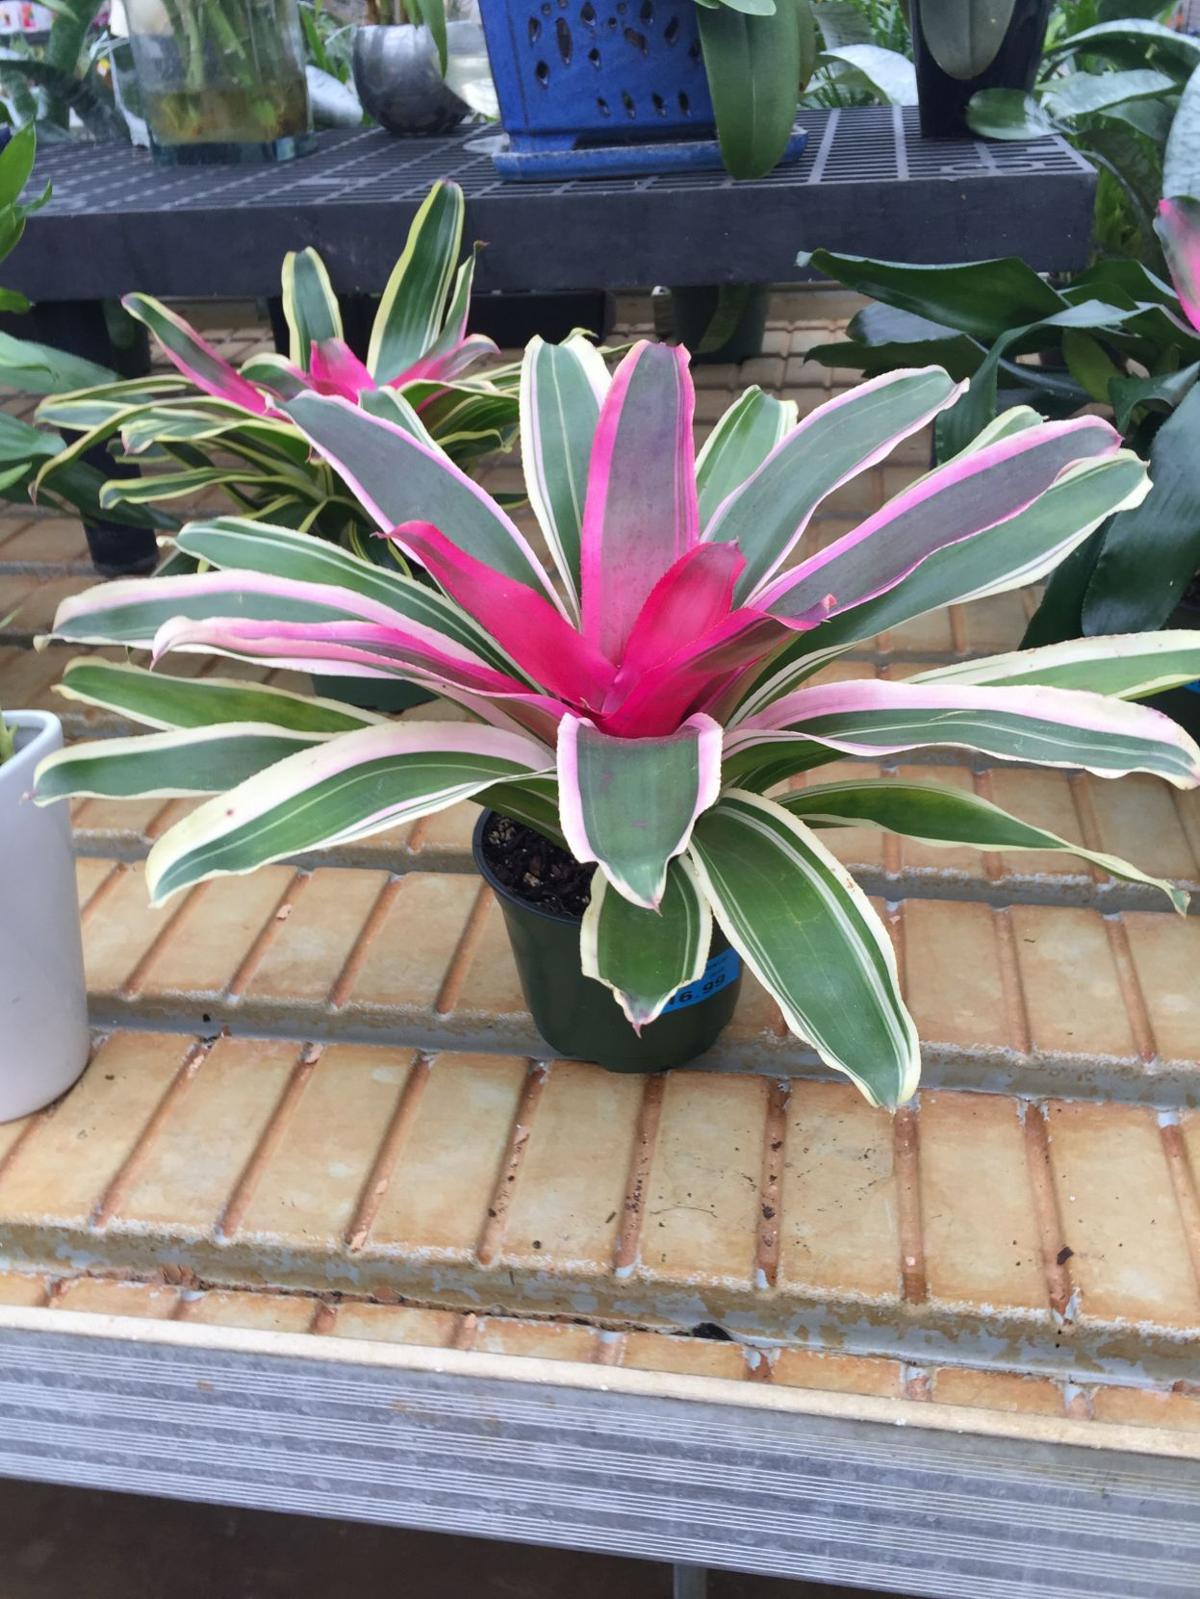 Bromeliads bring tropical feel to NWI